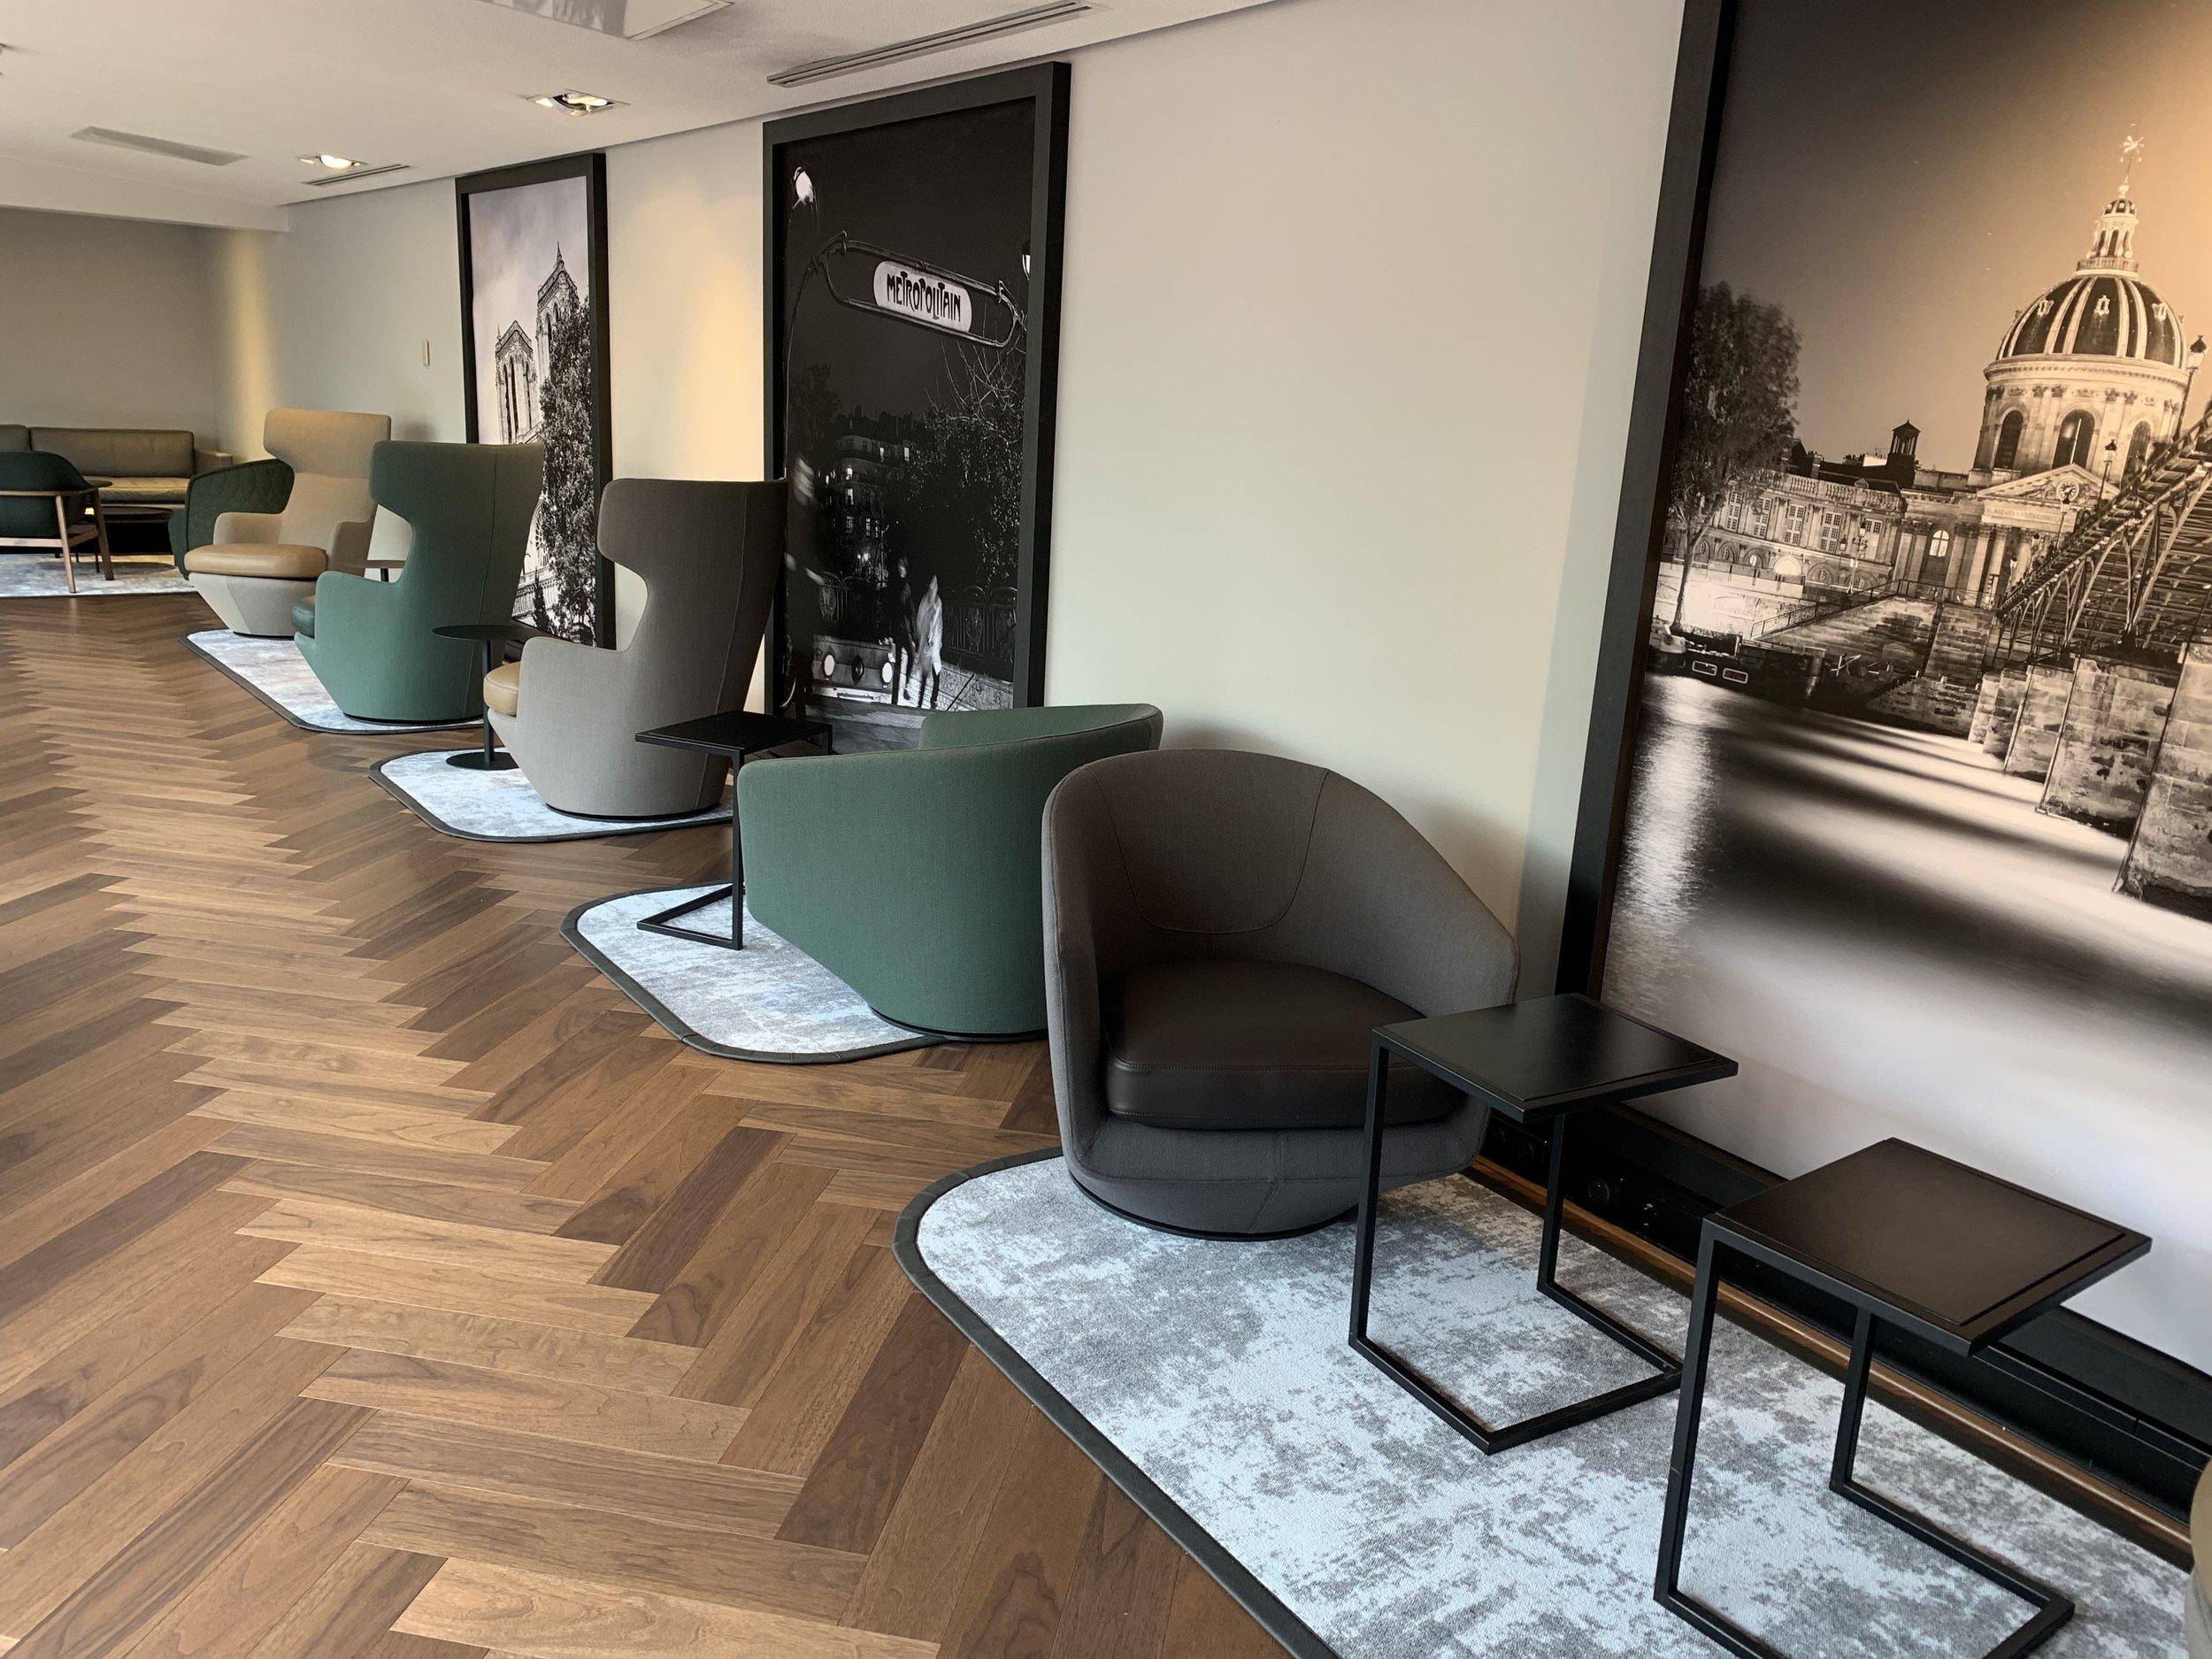 New Refurbished Star Alliance Lounge Paris Charles De Gaulle 8.jpeg